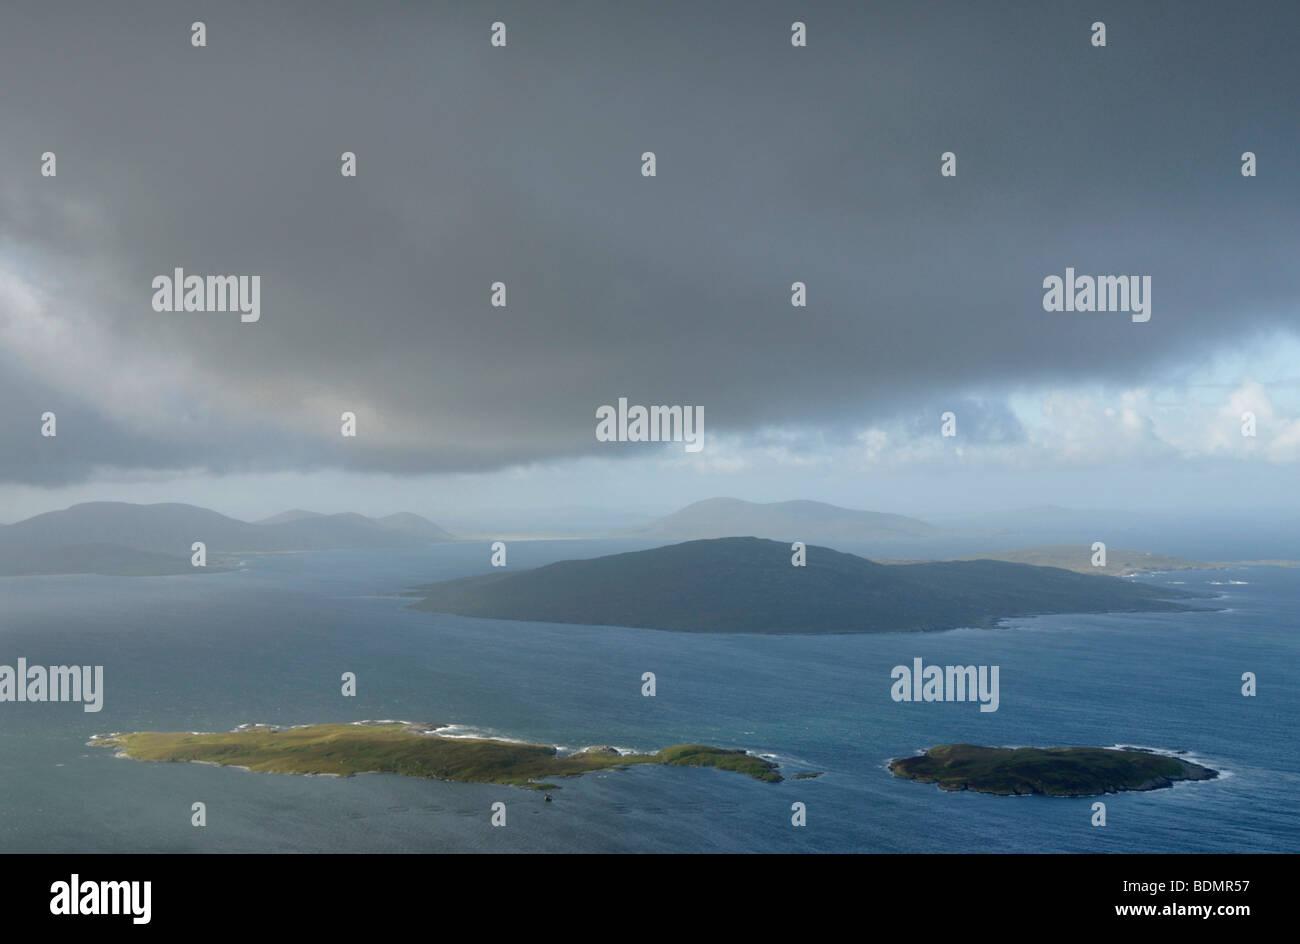 Taransay from Cleiseabhal, Isle of Harris, Scotland - Stock Image